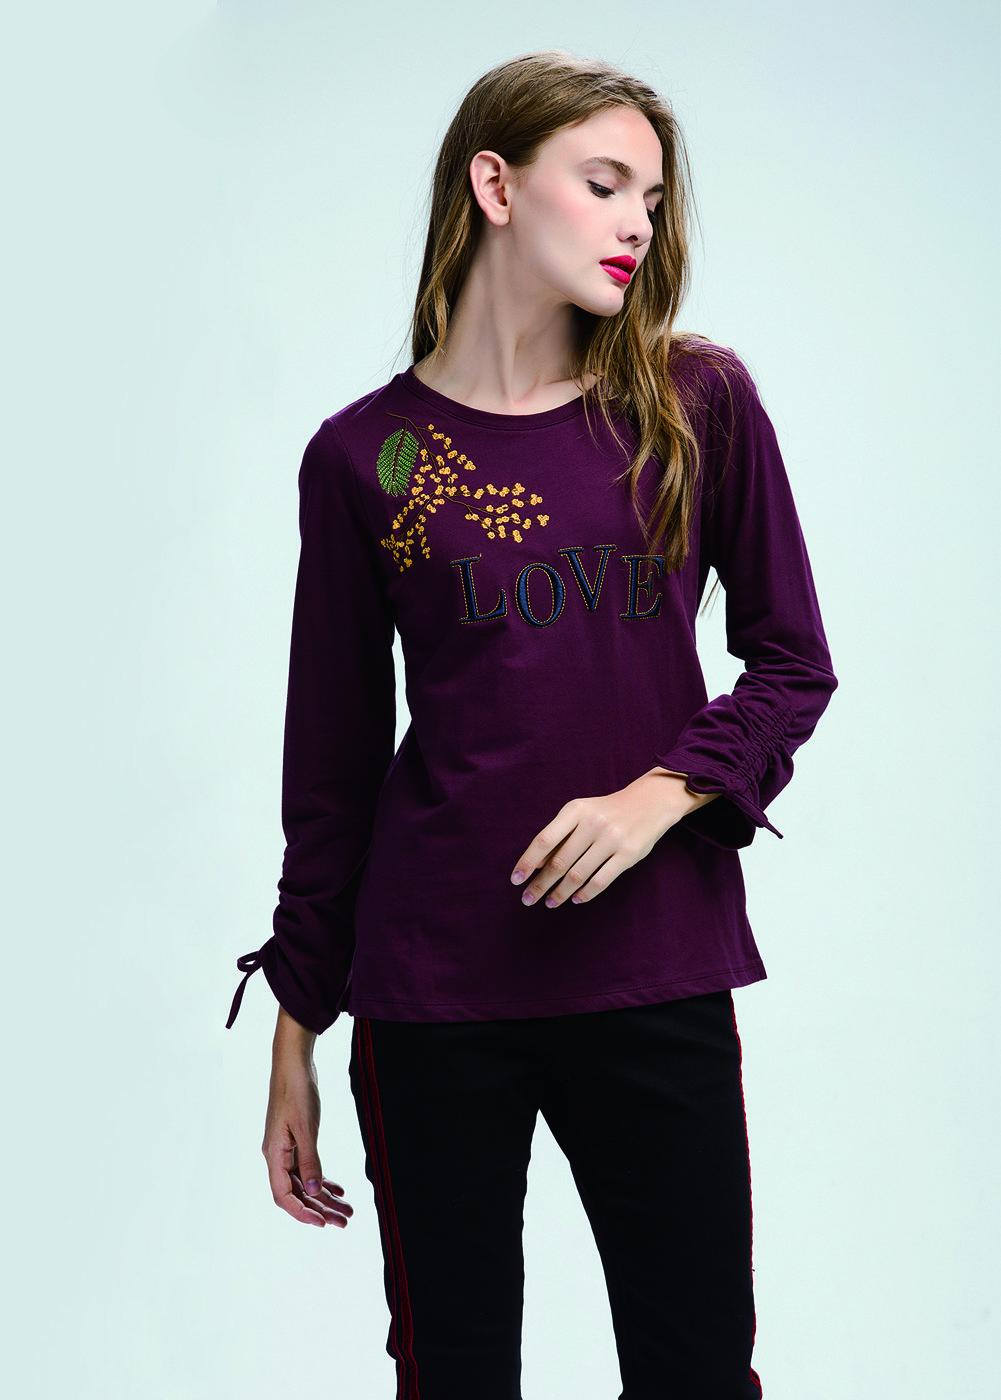 Camiseta algodón bordada